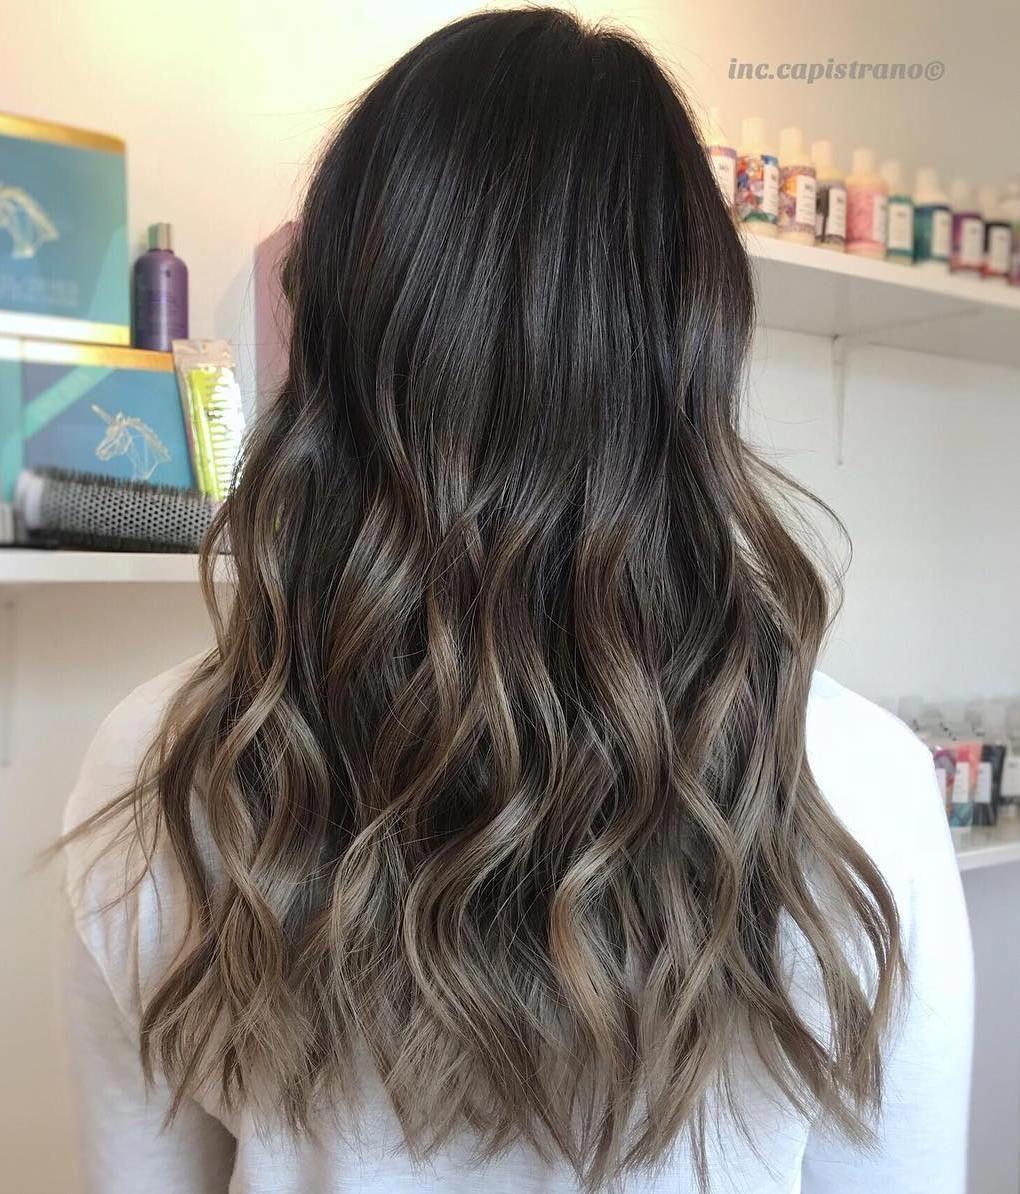 Mushroom Brown Hair A Hot New Trend You Ll Fall In Love With Mushroom Hair Ash Brown Hair Balayage Balayage Straight Hair